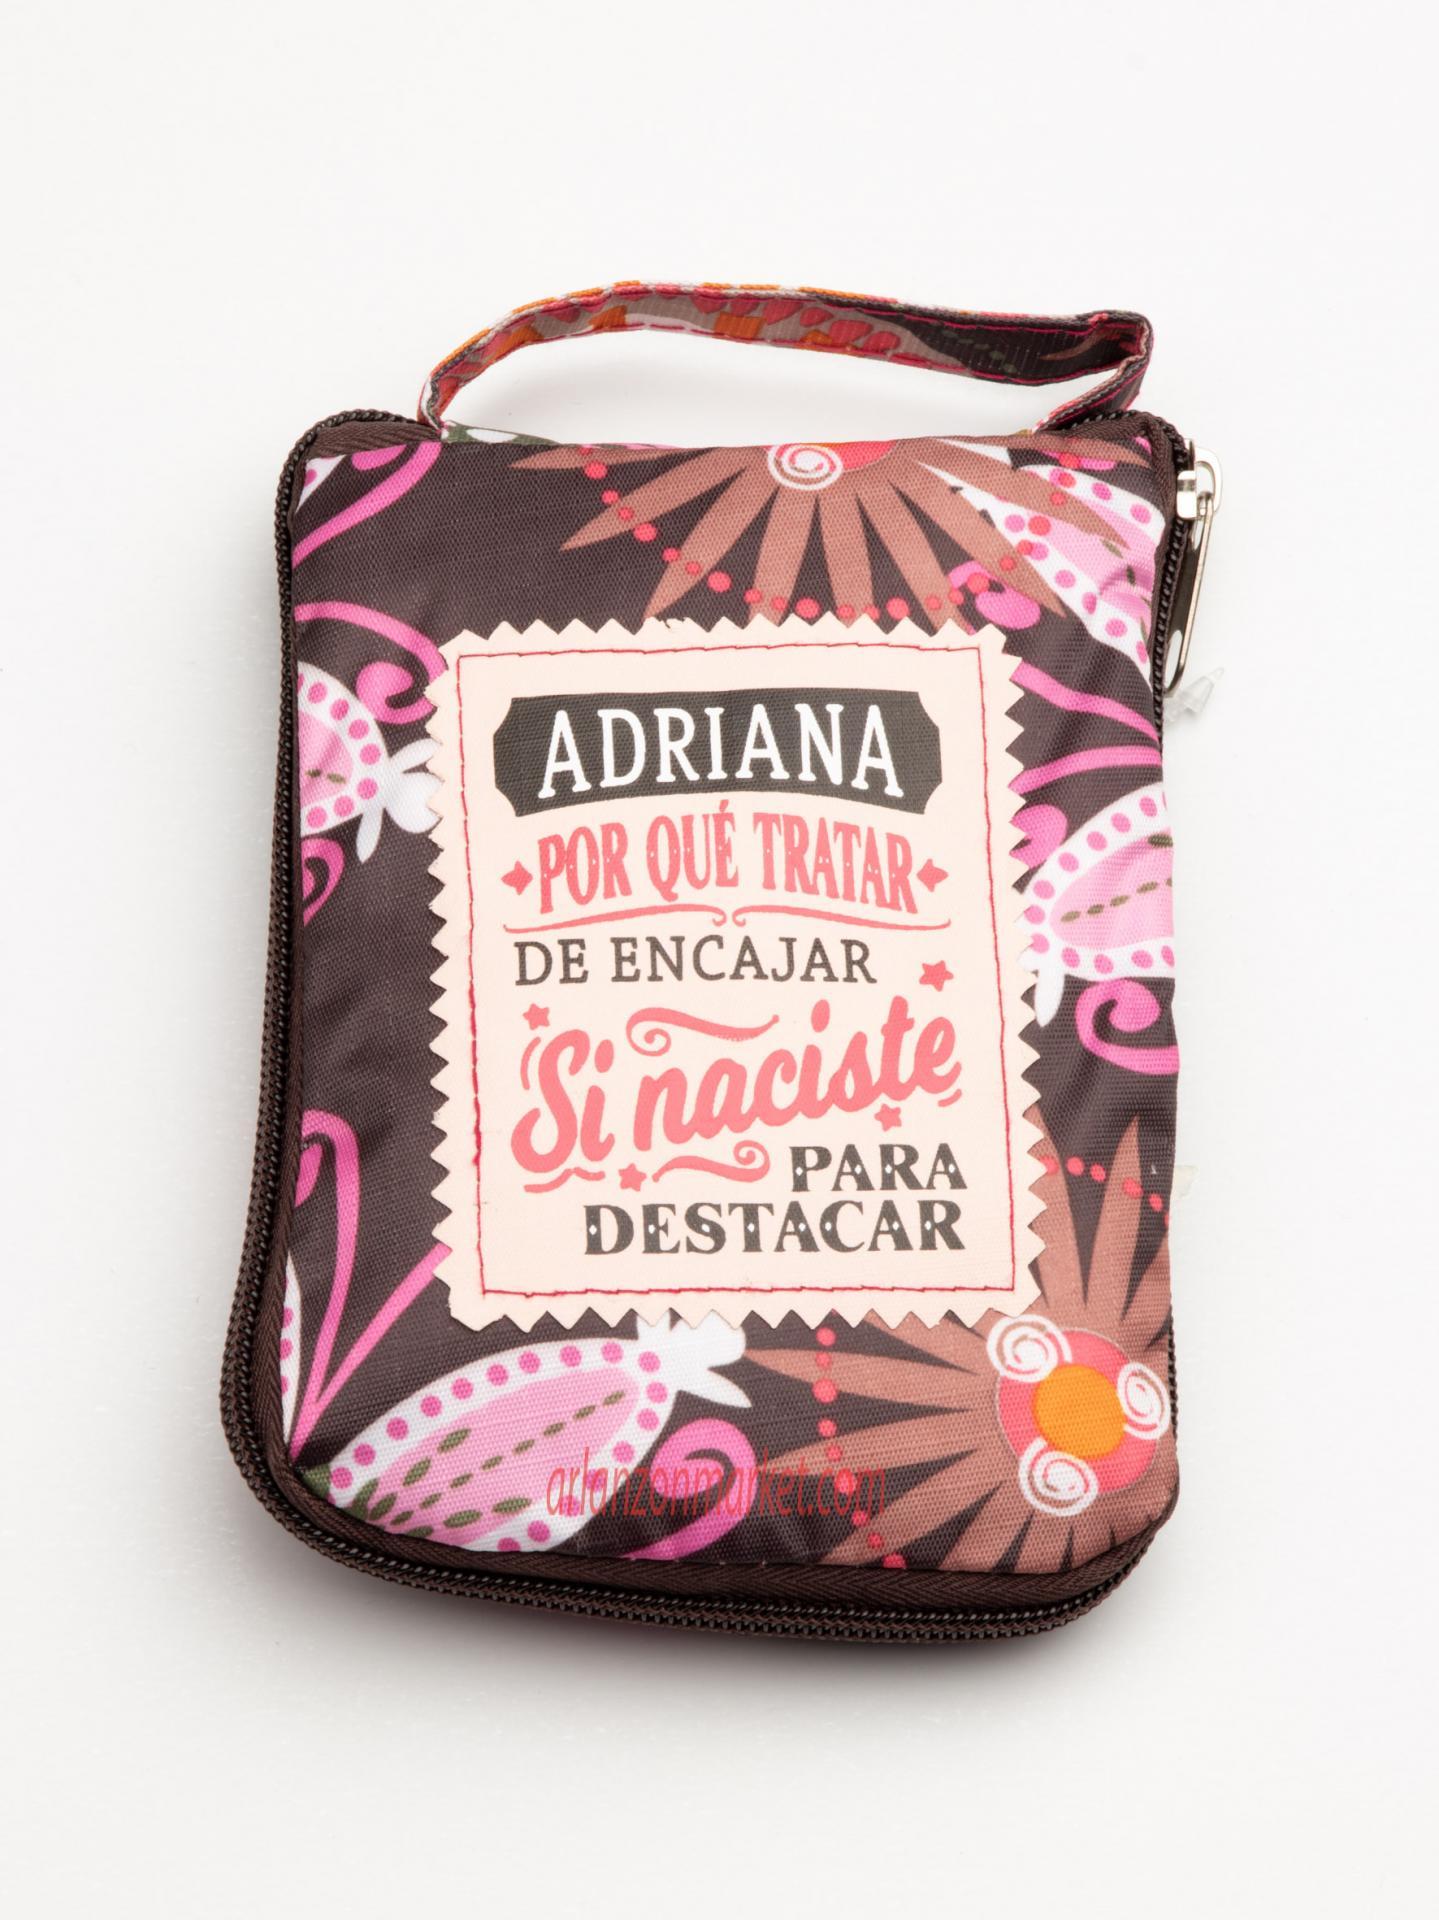 Bolsa con mensaje ADRIANA